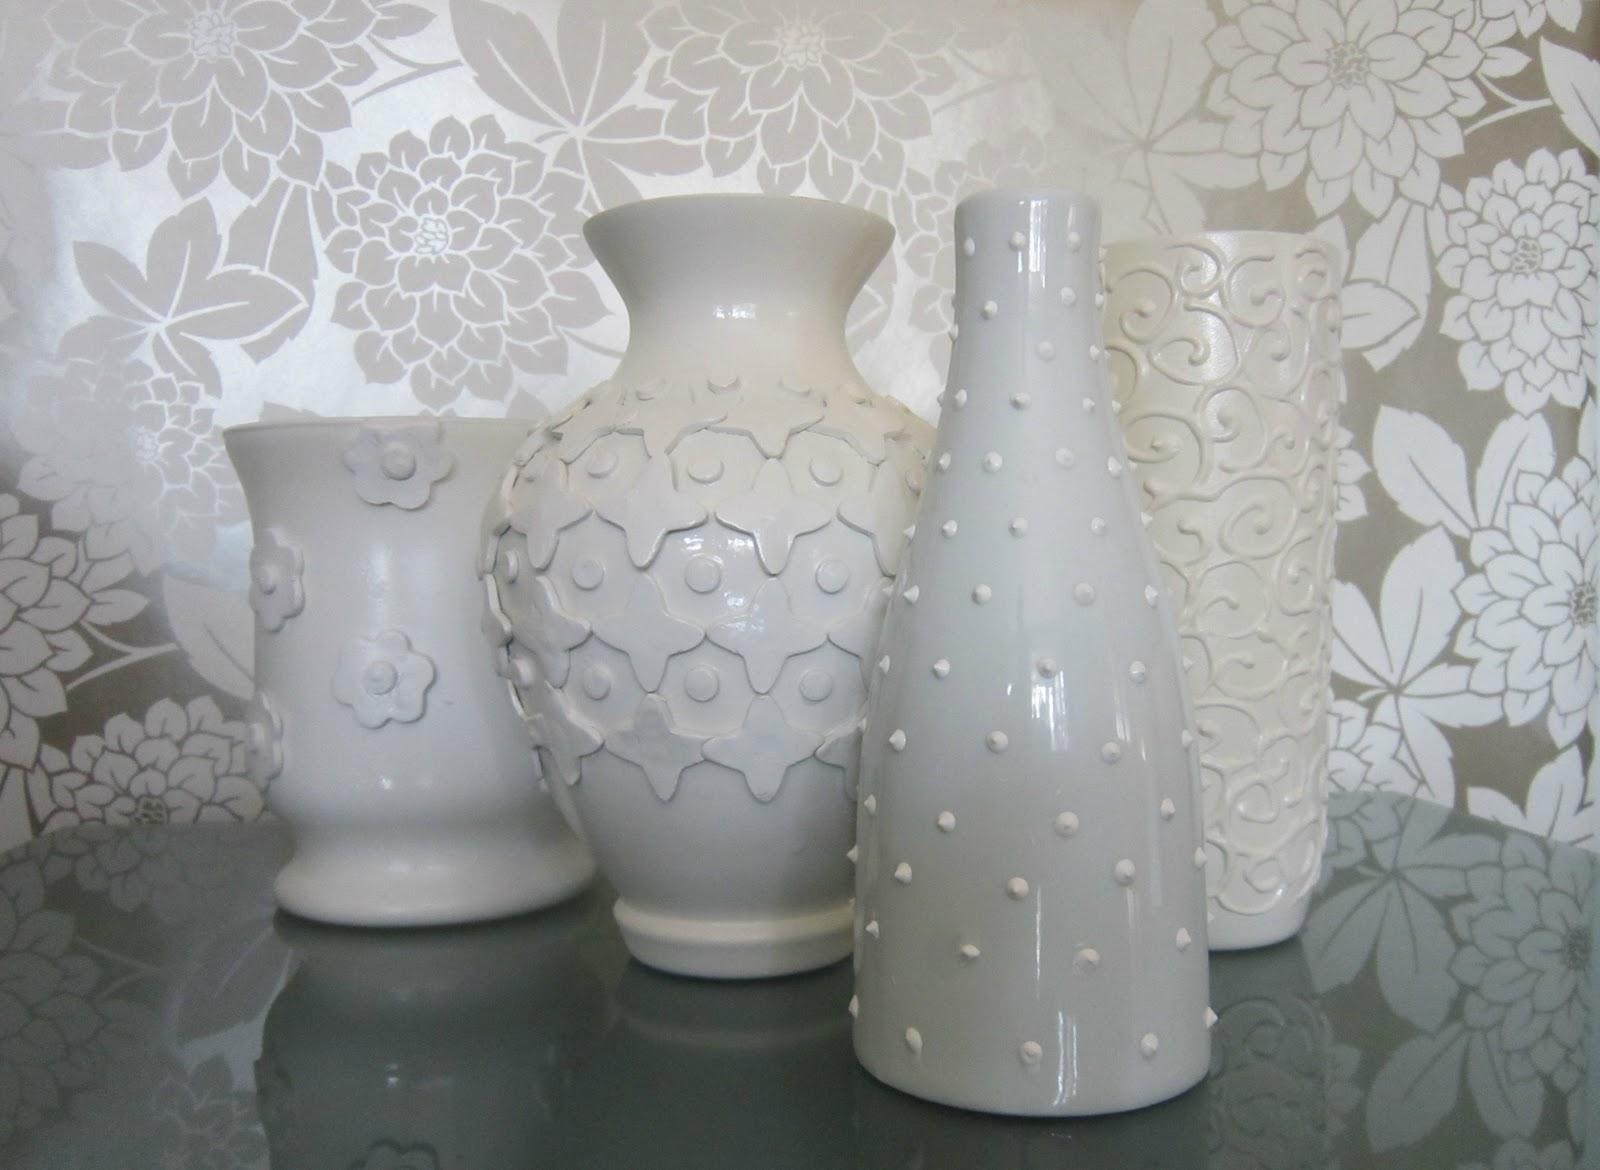 design megillah jonathan adler inspired vases. Black Bedroom Furniture Sets. Home Design Ideas